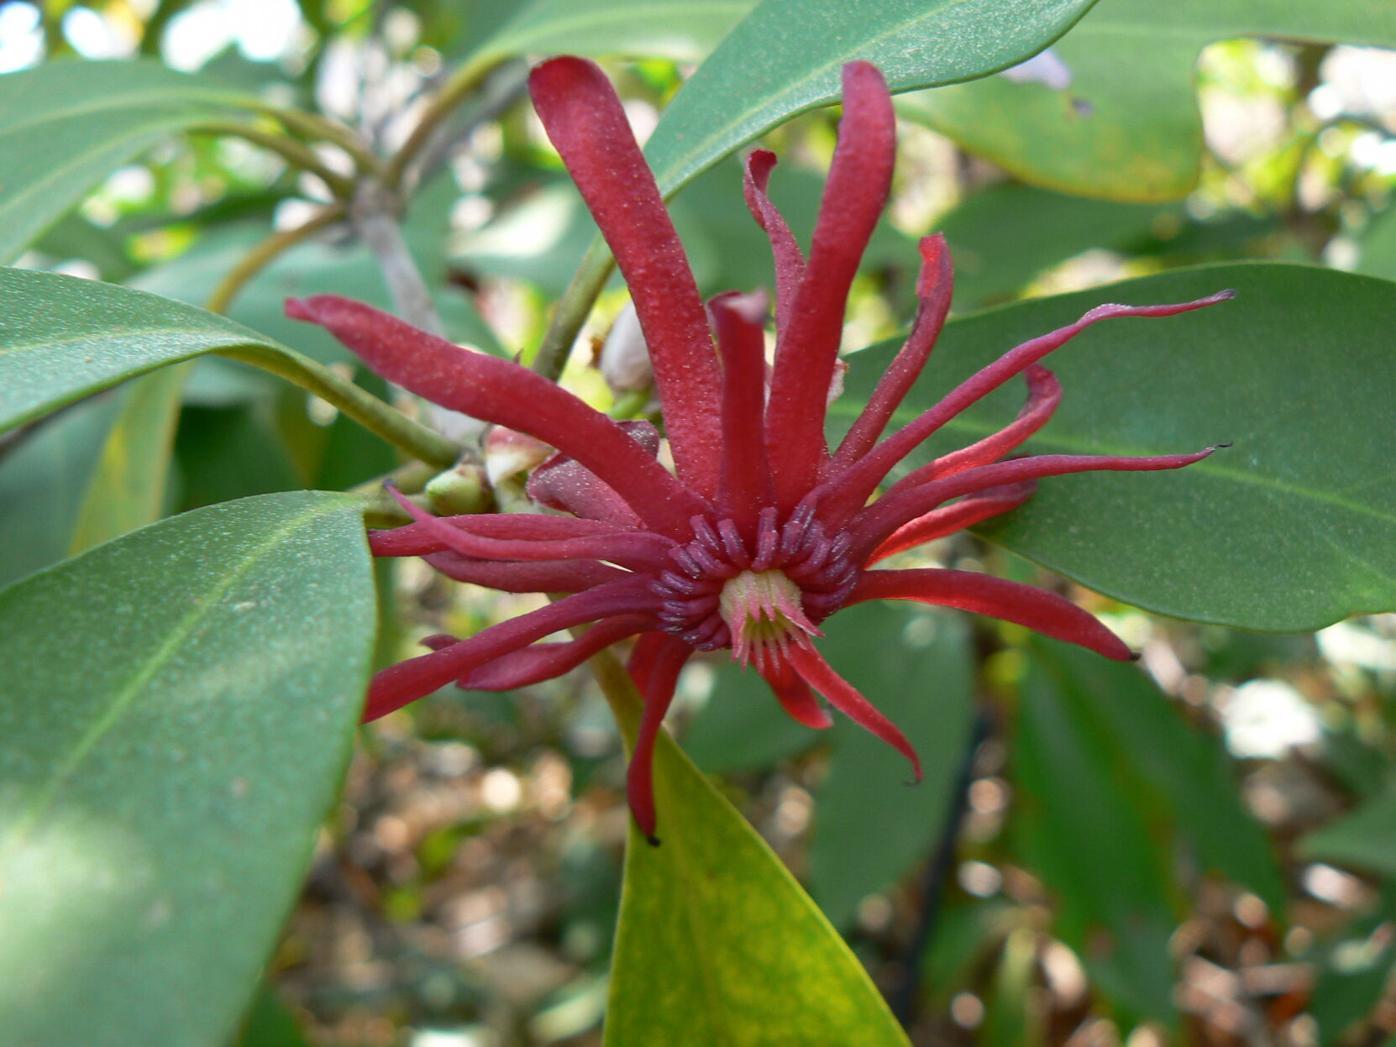 090921_CTN_Florida anise_bloom_Mary Tucker (1).JPG